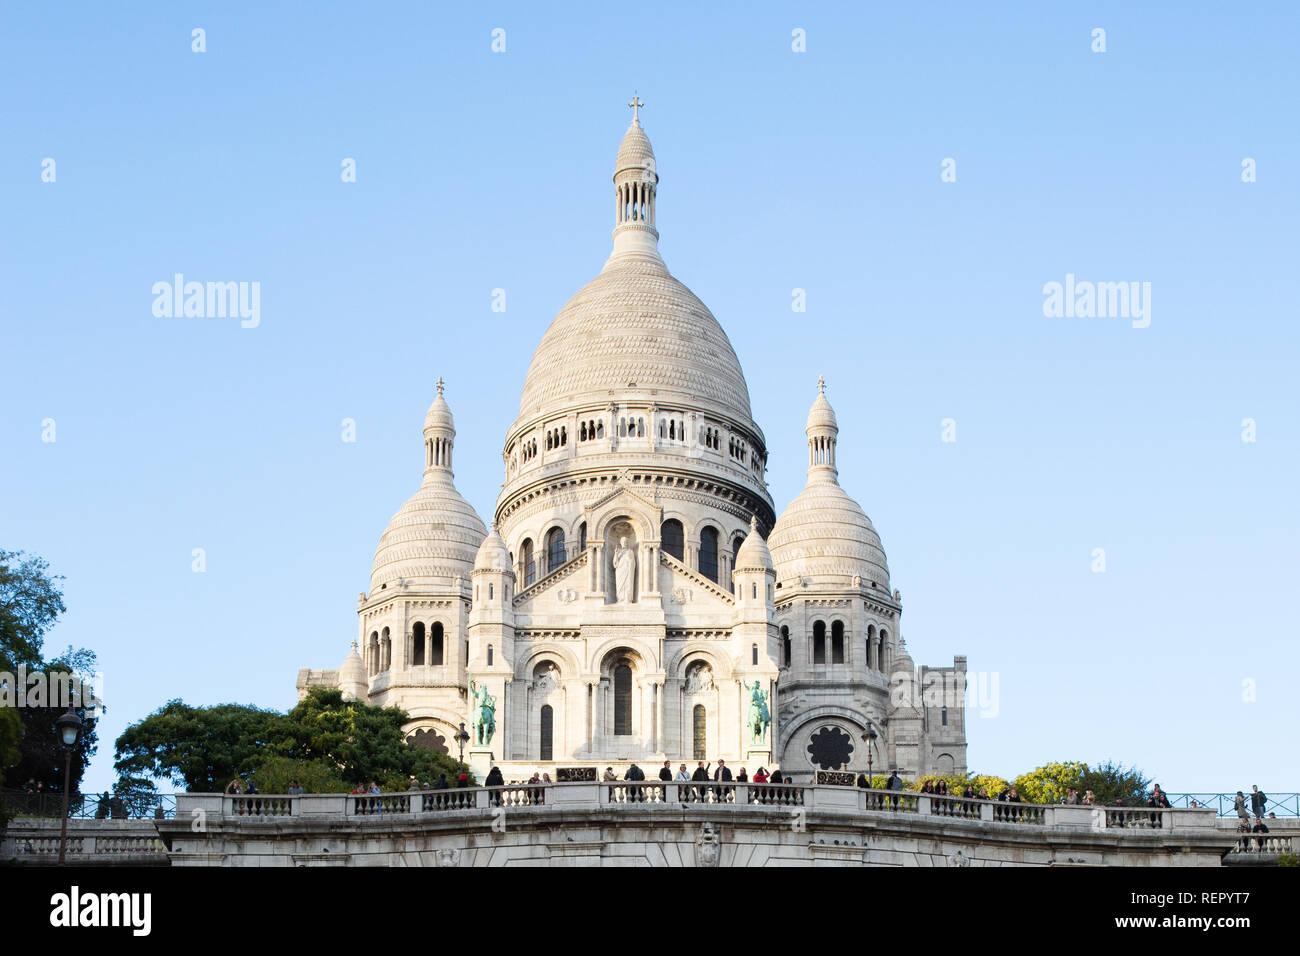 Paris (France) - Basilica of the Sacred Heart of Paris, or Montmartre Sacré-Cœur, is a popular landmark and the 2nd most visited monument in Paris Stock Photo